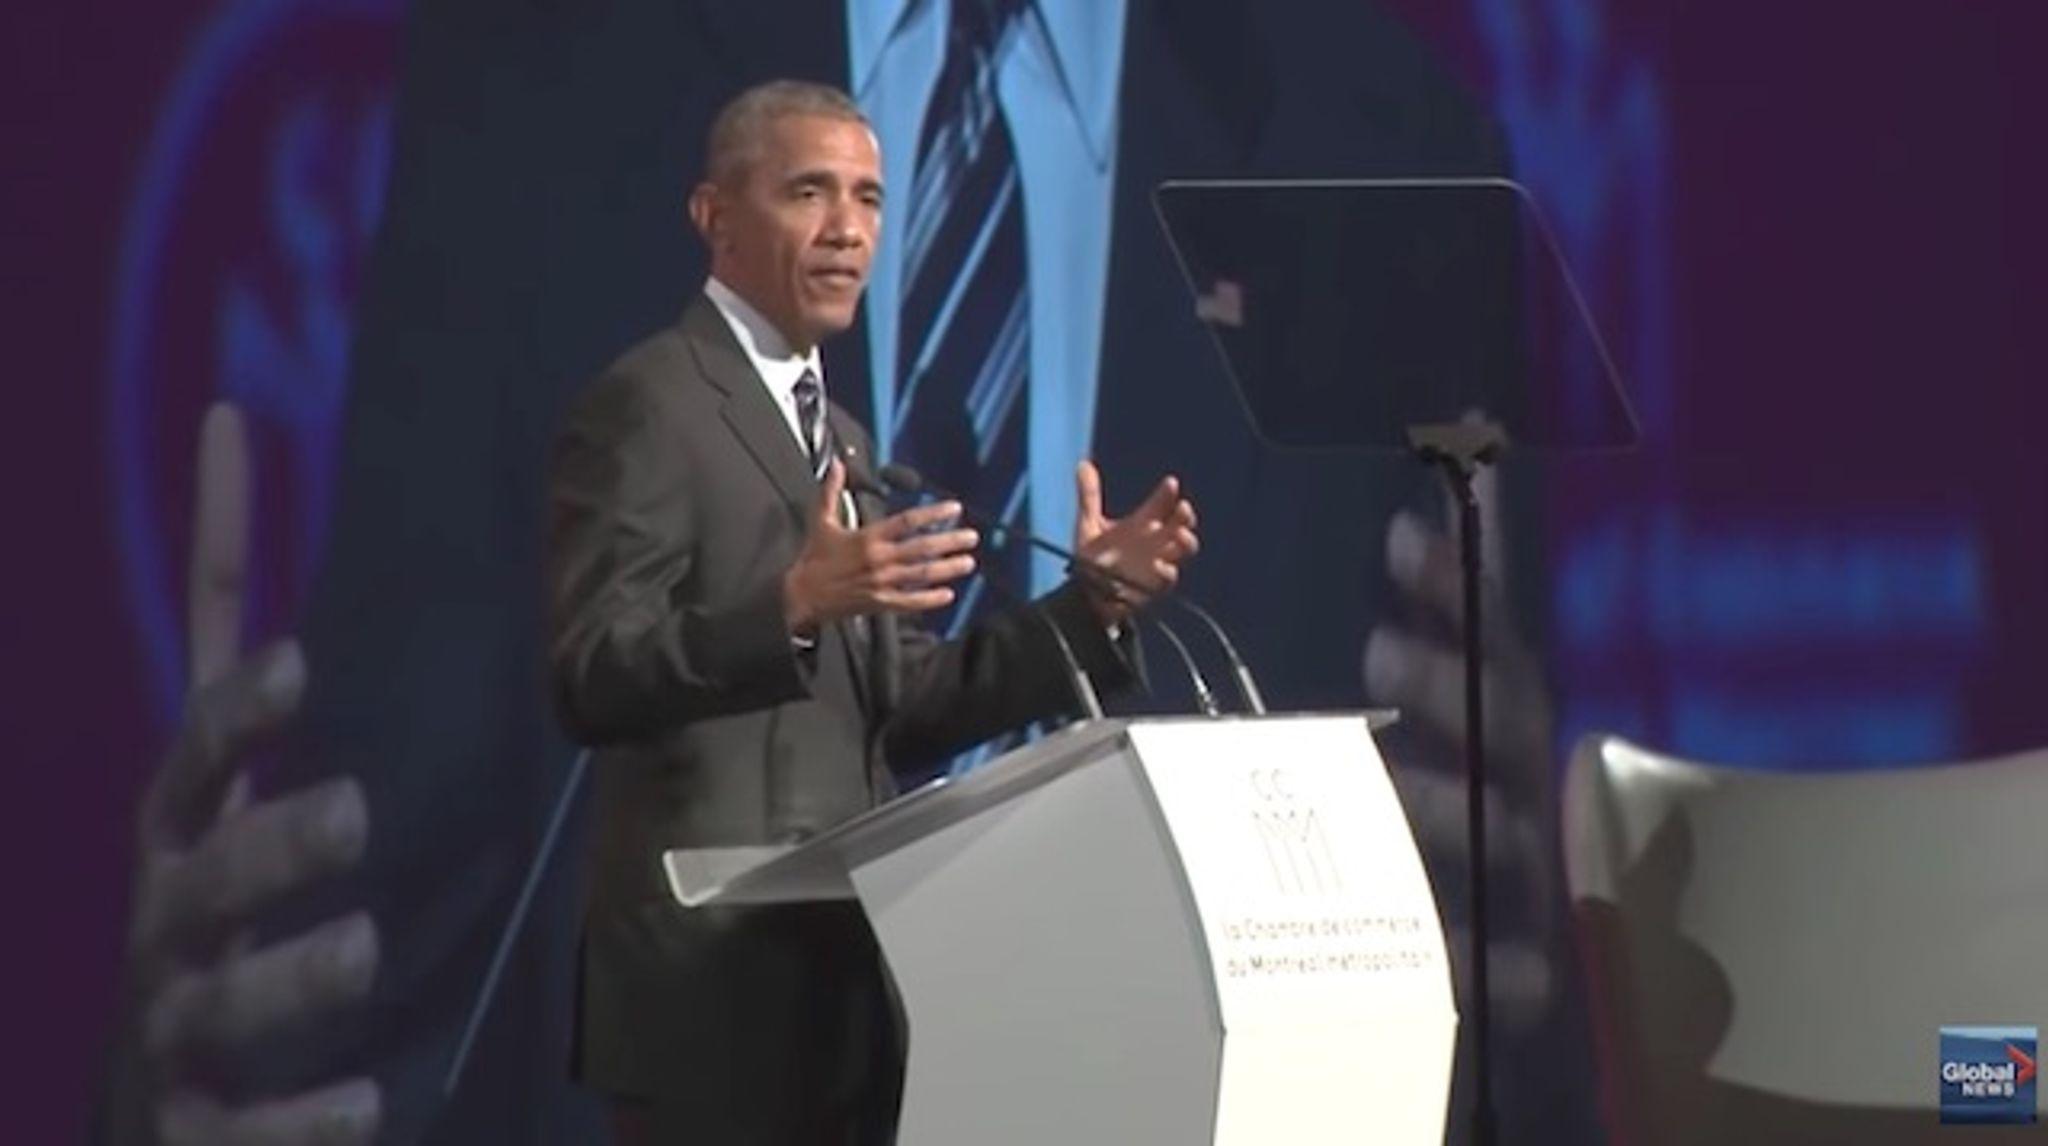 Barack Obama: \'The future does not belong to strongmen\' - Washington ...